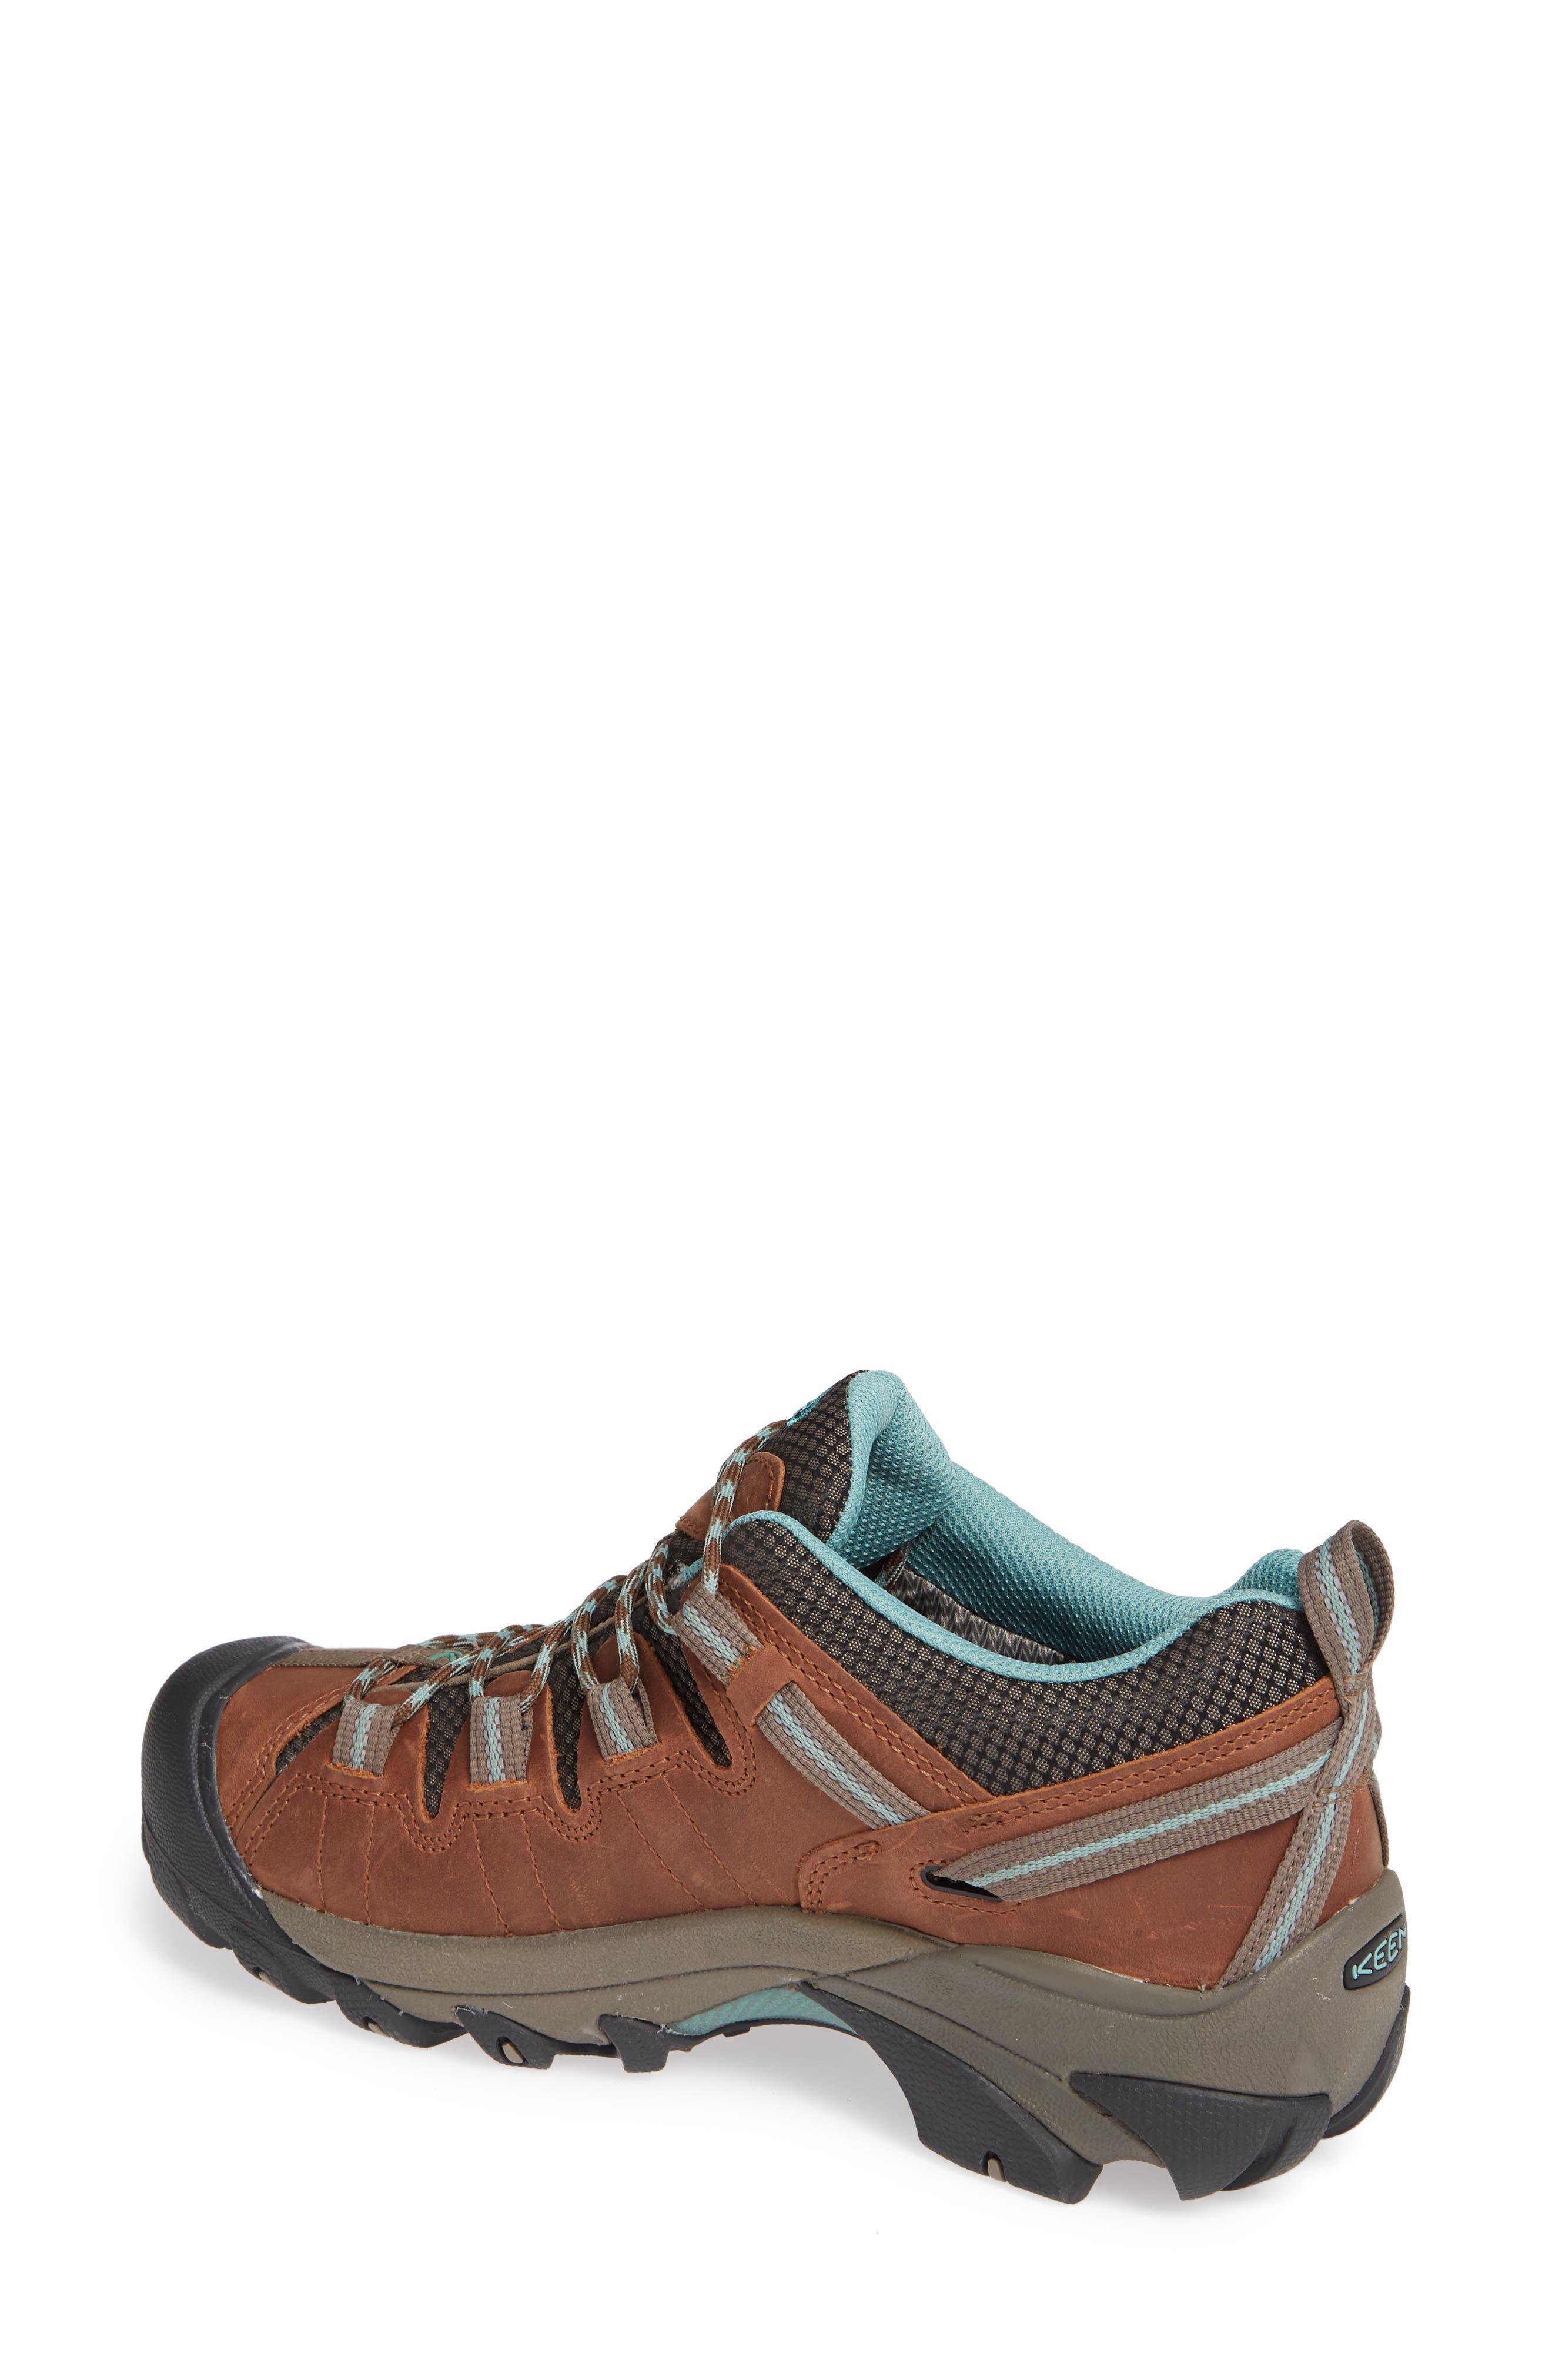 KEEN, 'Targhee II' Walking Shoe, Alternate thumbnail 2, color, DARK EARTH/ WASABI NUBUCK